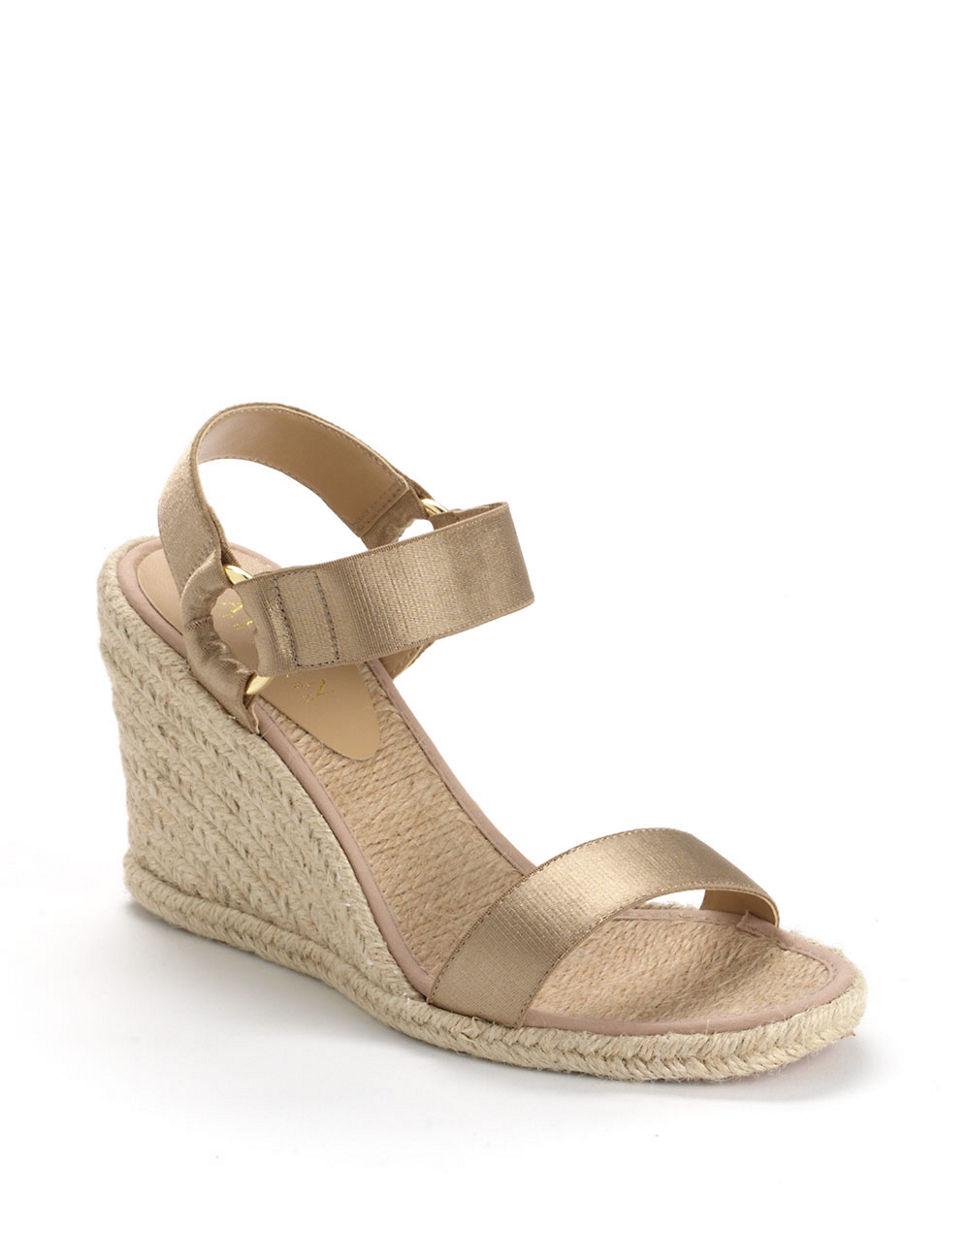 lauren by ralph lauren indigo banded espadrille wedge sandals in natural lyst. Black Bedroom Furniture Sets. Home Design Ideas